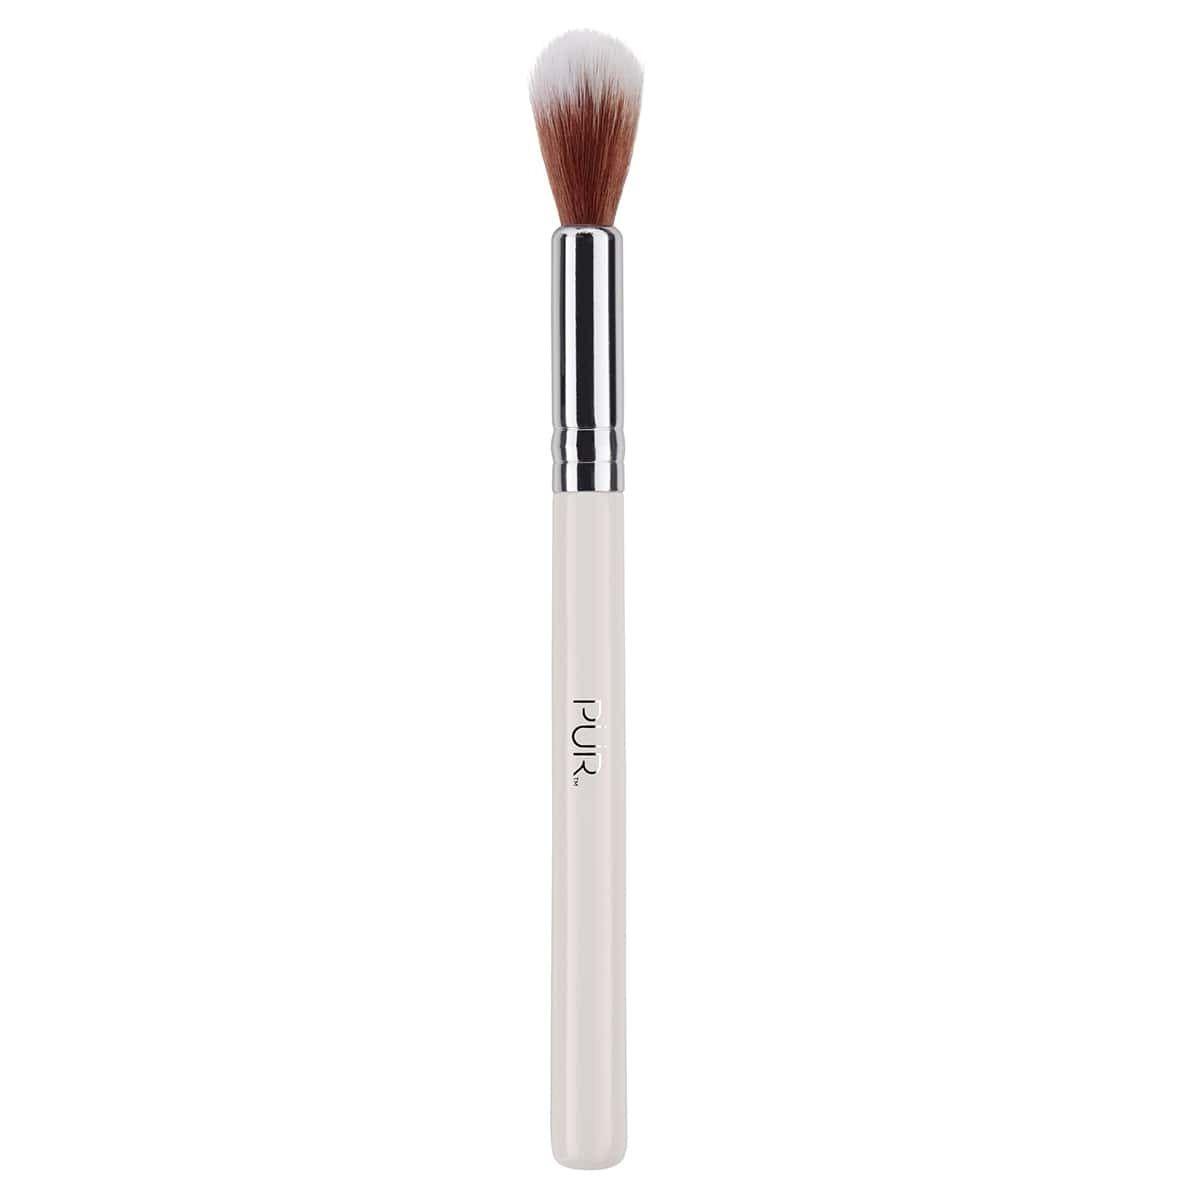 PÜR Airbrush Blurring Concealer Brush